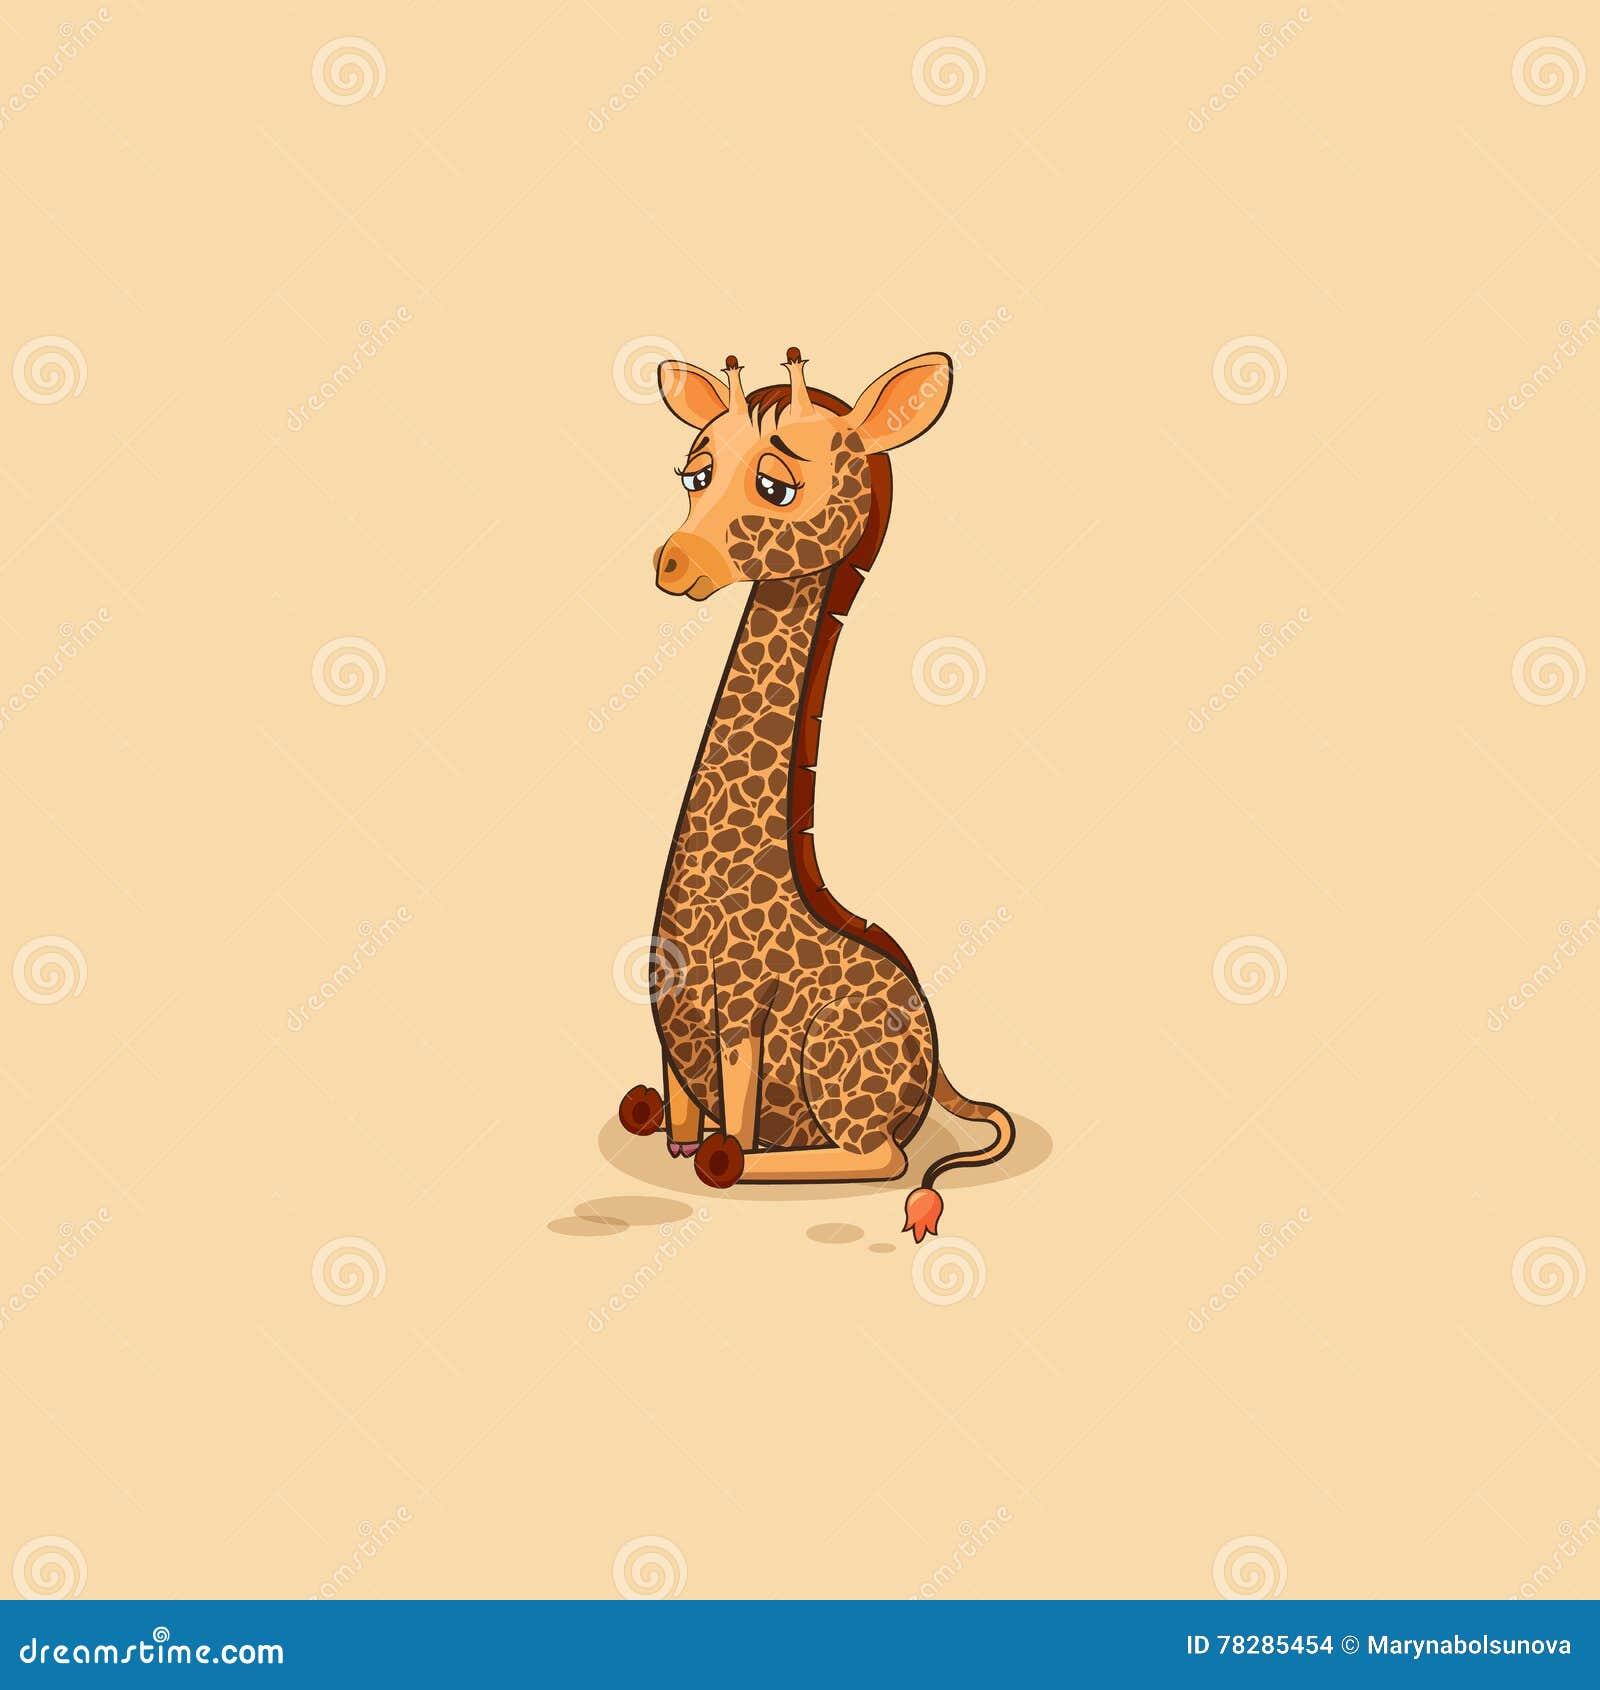 Emoji character cartoon Giraffe sad and frustrated